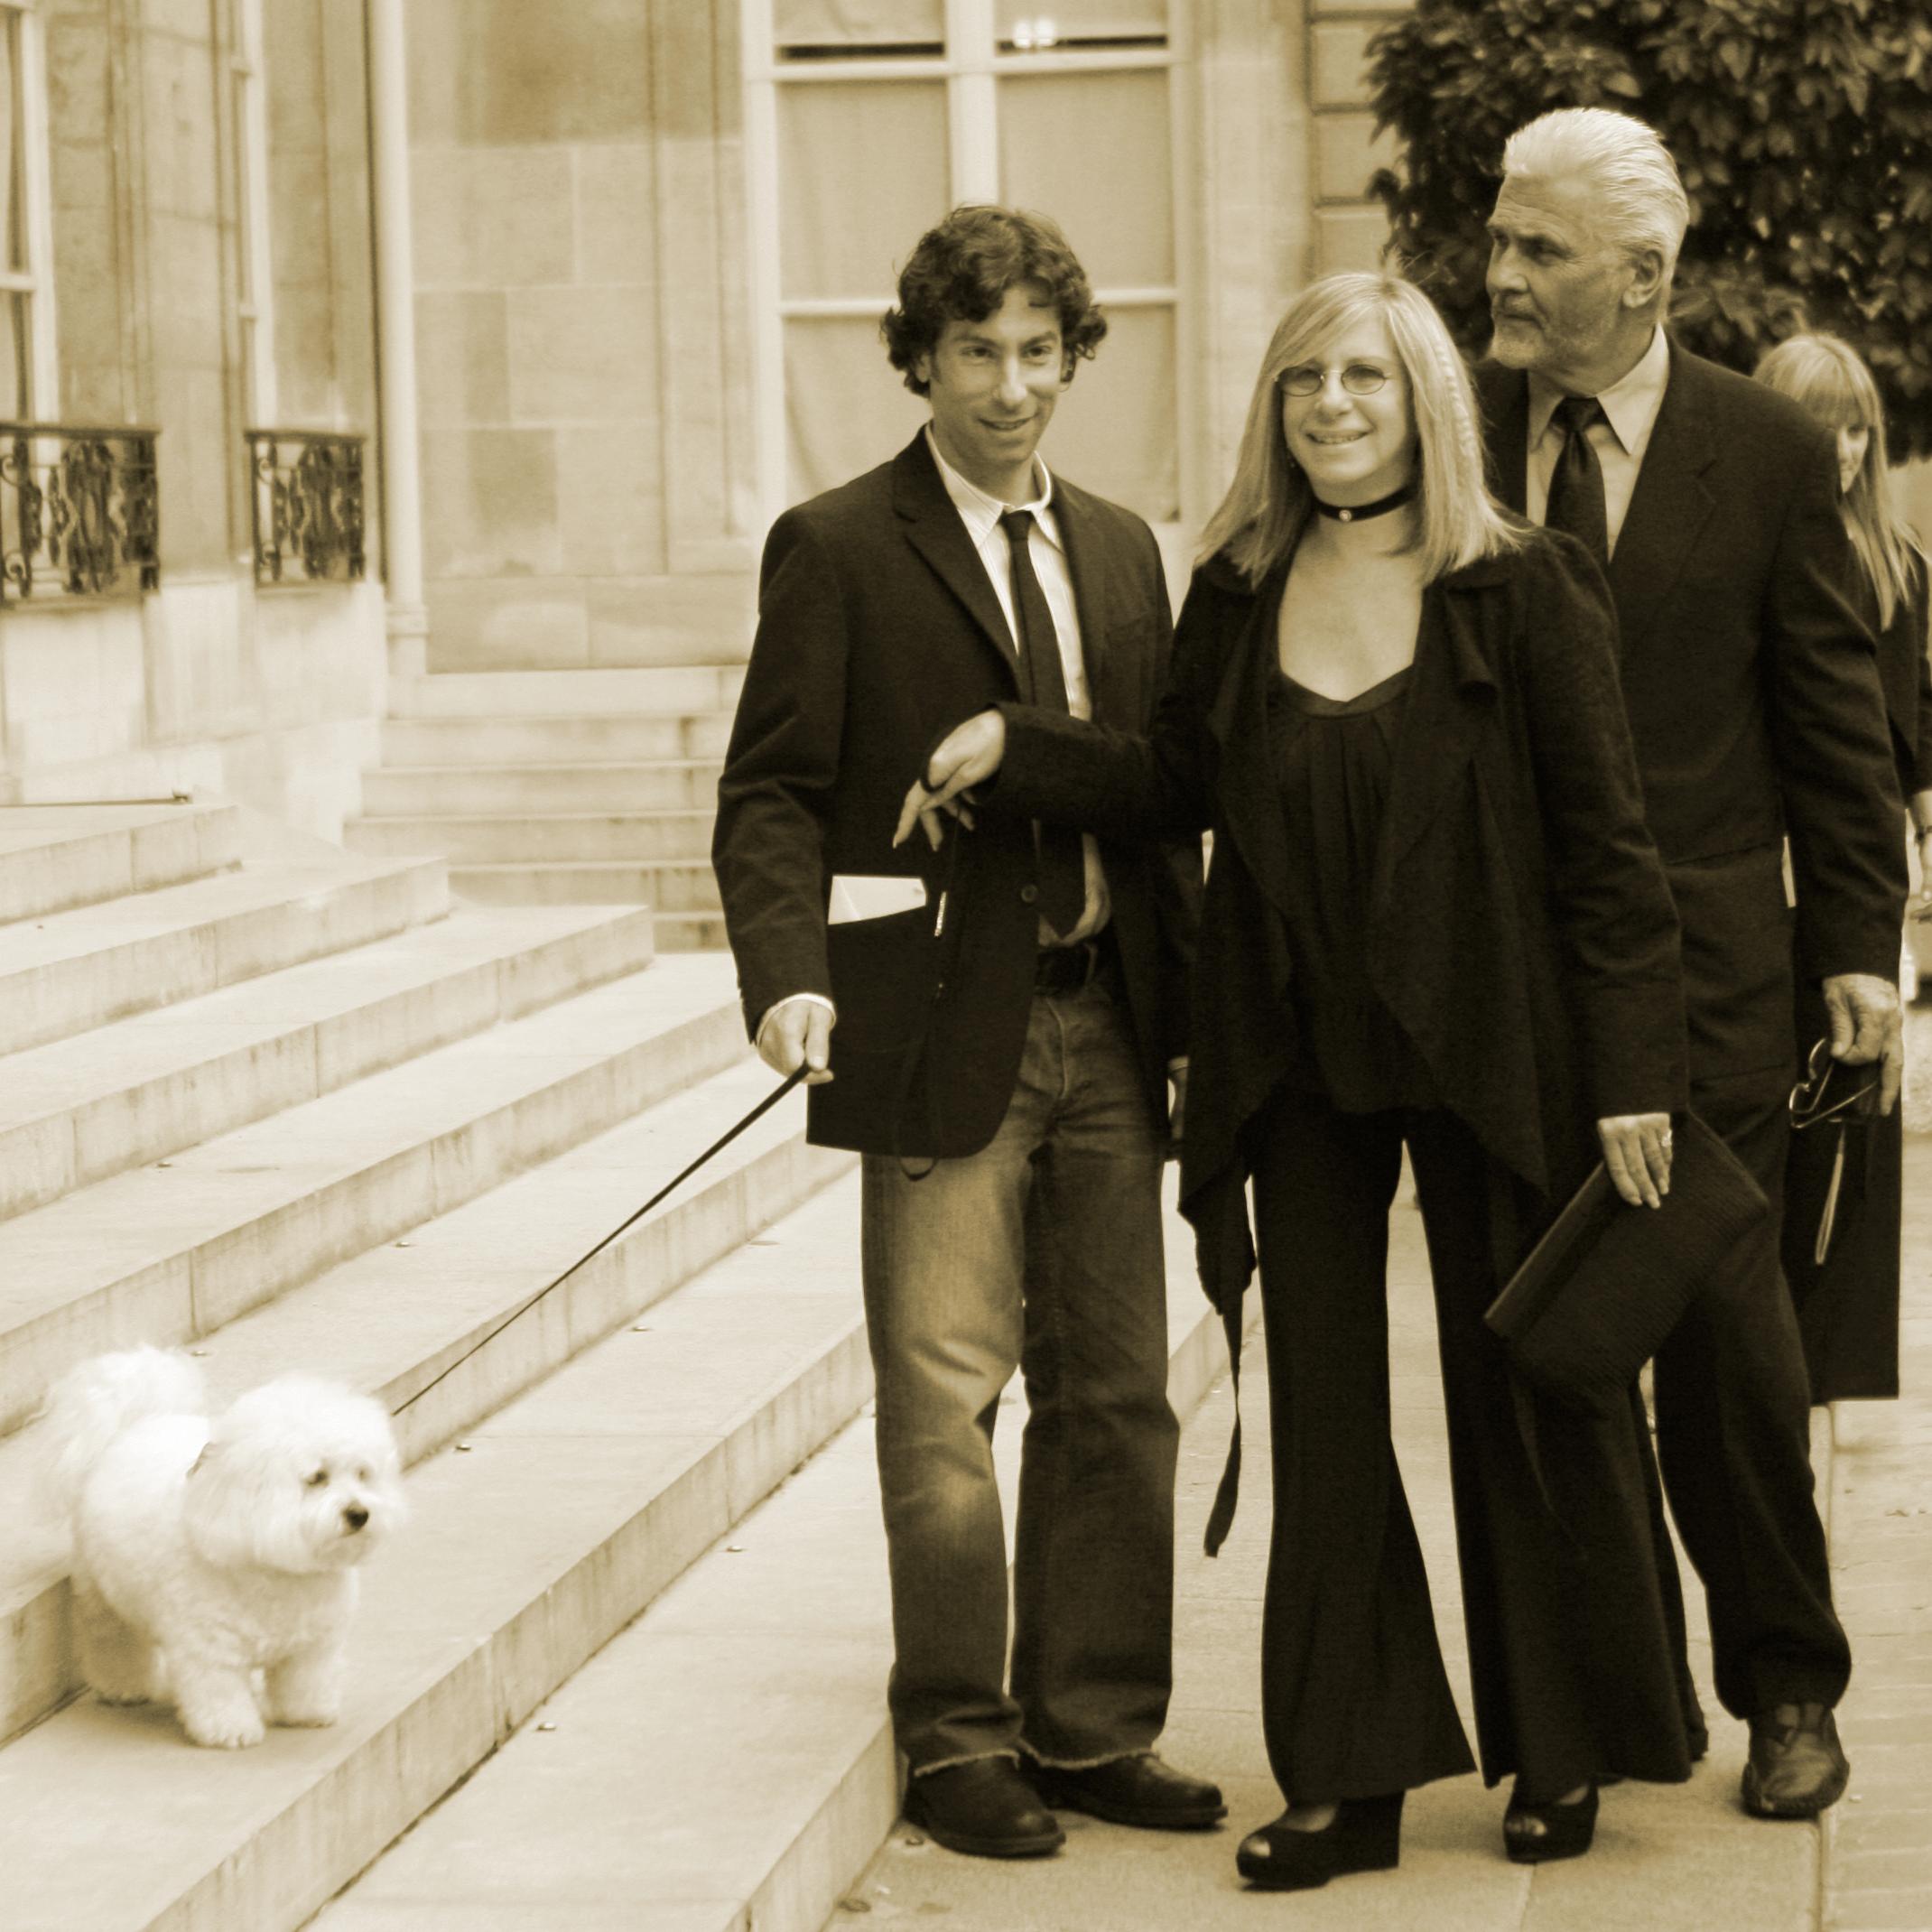 Barbra Streisand and her cloned dog.